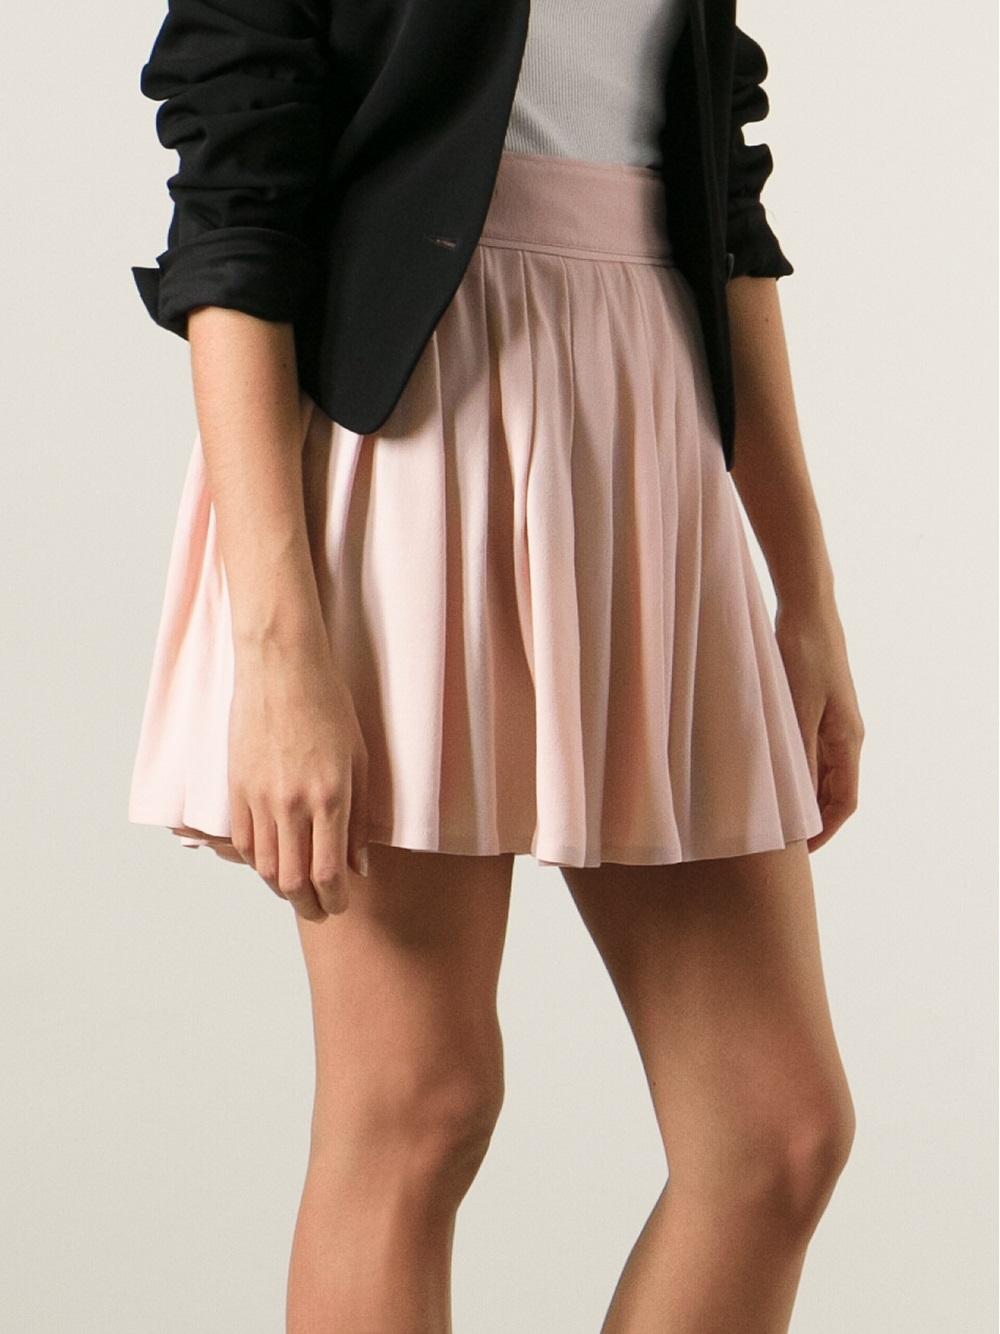 Red Valentino gathered mini skirt Pictures For Sale 8KbZoSH8